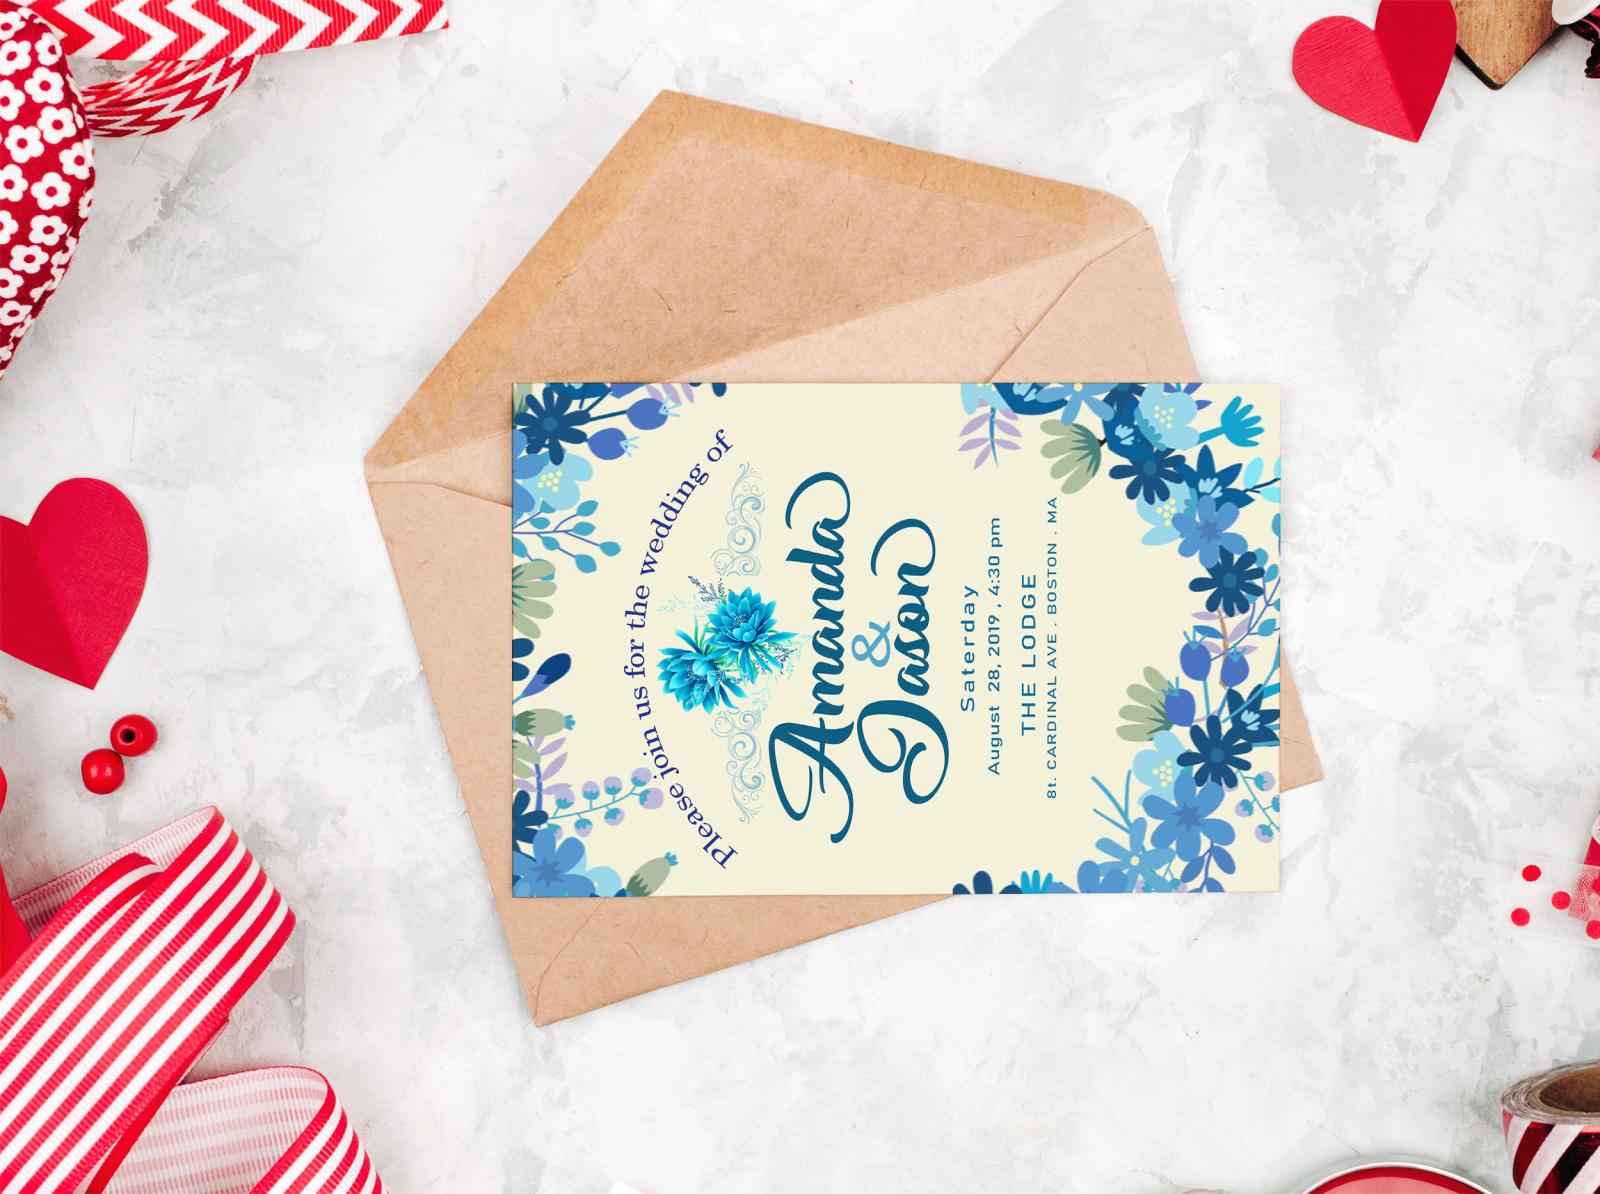 Free Invitation Greeting Card Mockup By Maimuna A Halim On